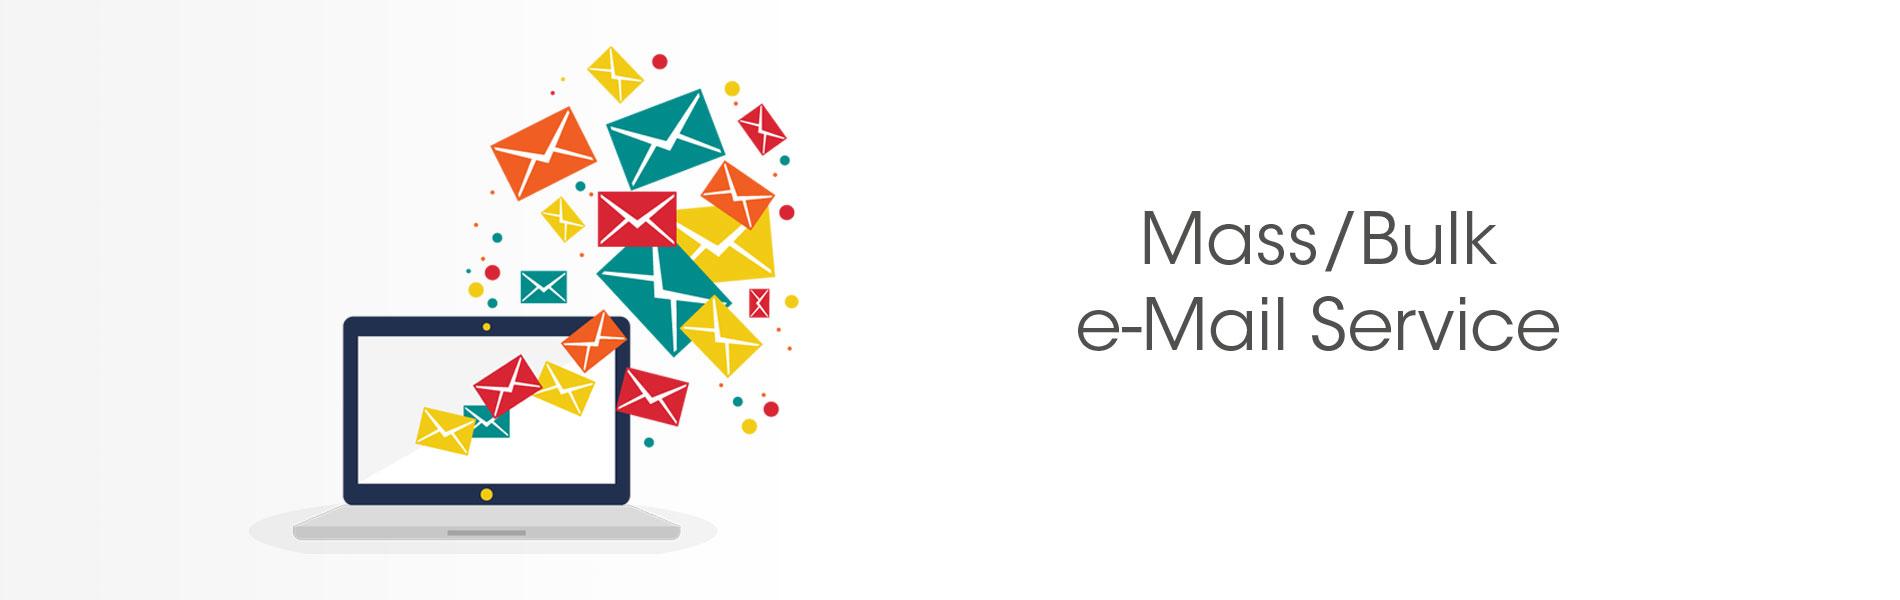 Mass/Bulk e-Mail Service | Web Global Technologies